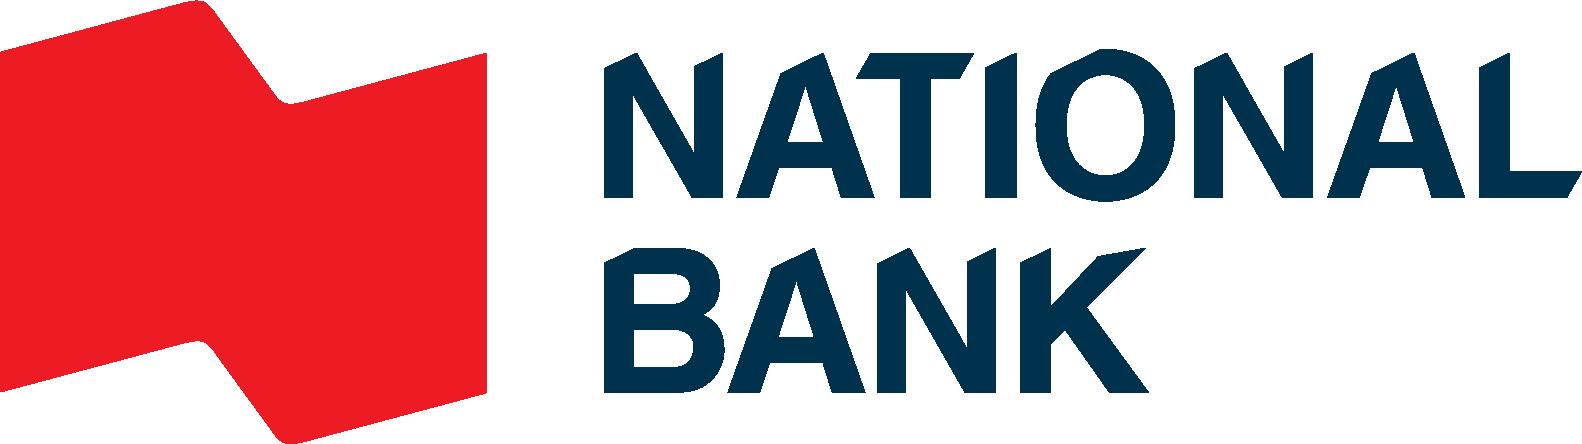 Nationa bank logo